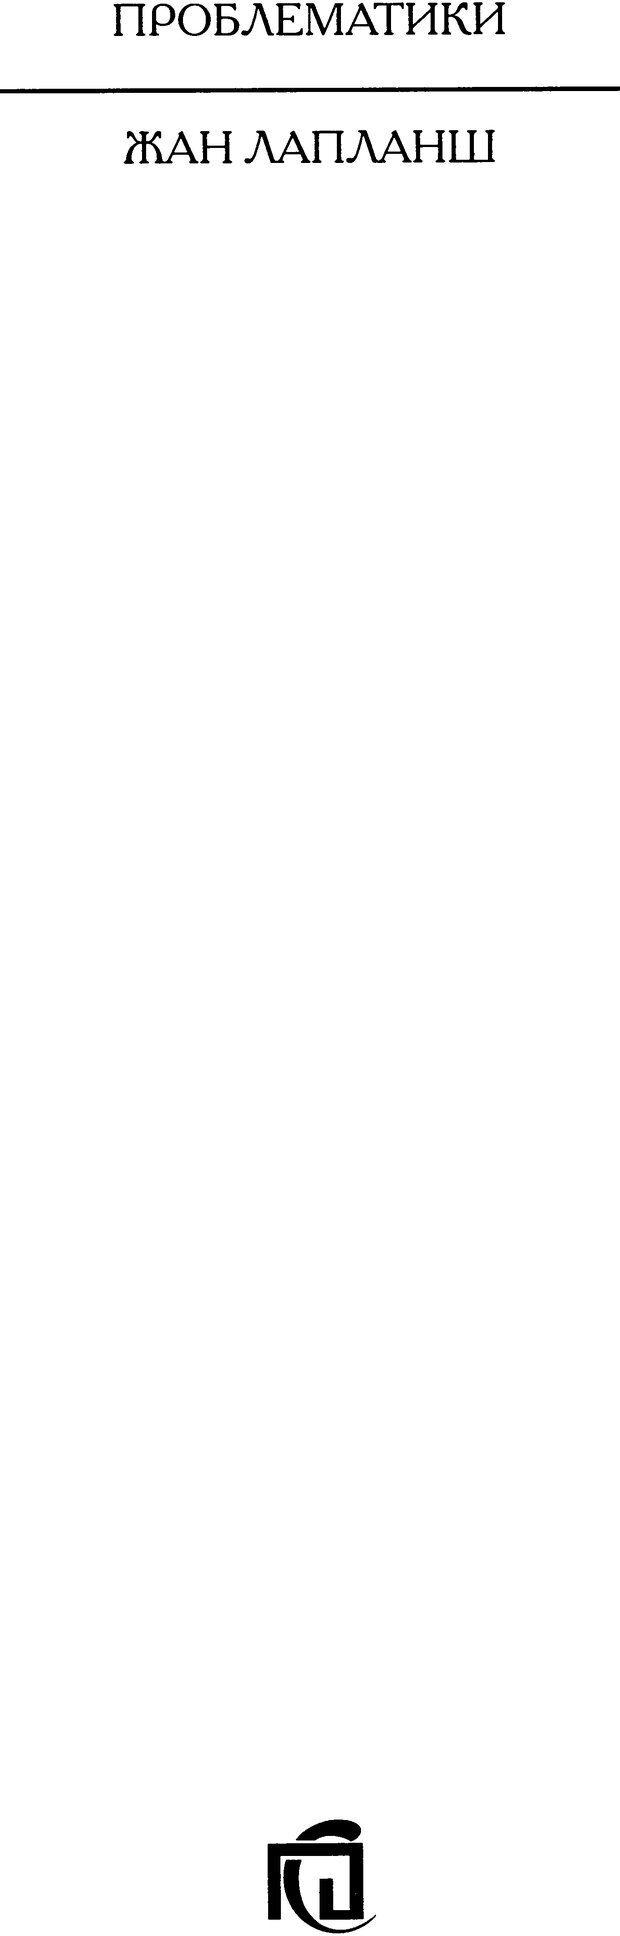 DJVU. Проблематики I. Страх. Лапланш Ж. Страница 1. Читать онлайн